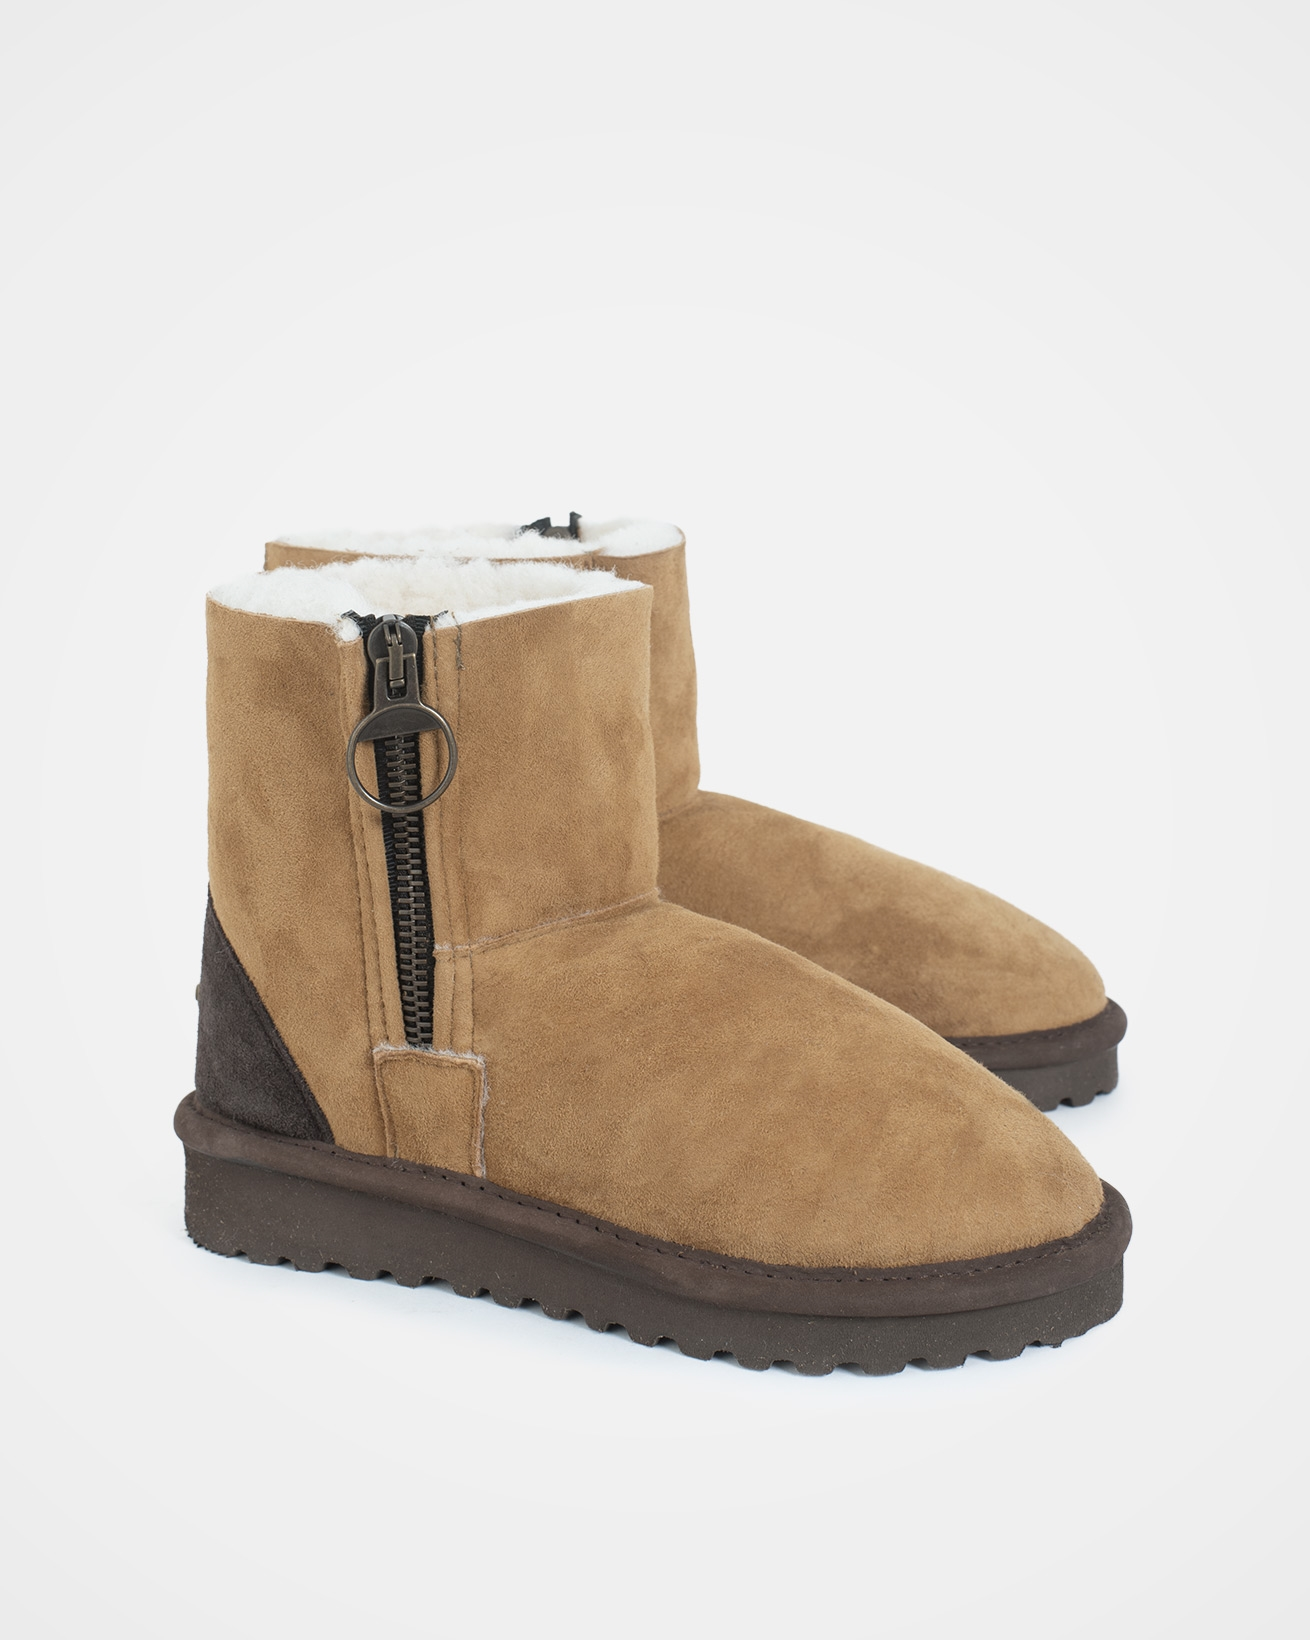 7611_aviator-shortie-boots_spice_pair.jpg